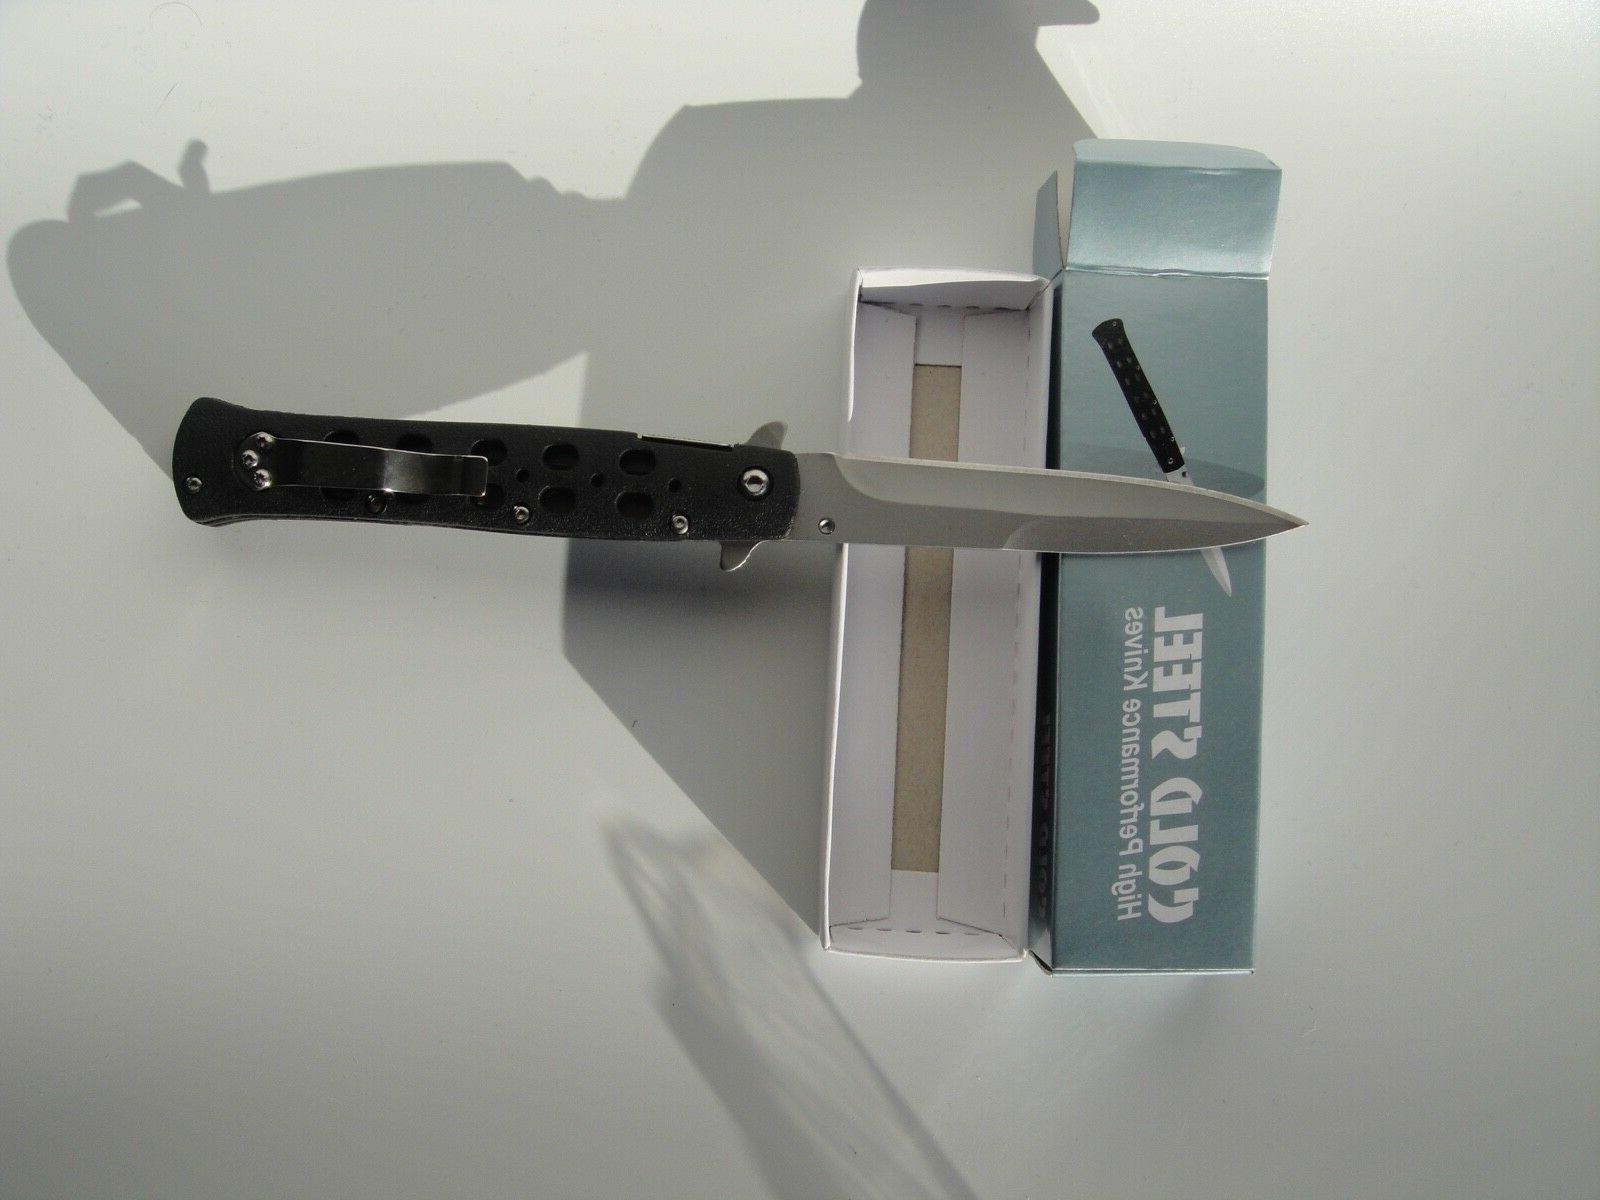 Cold Knife Ti-Lite Zytel Handle Folding Pocket Tactical